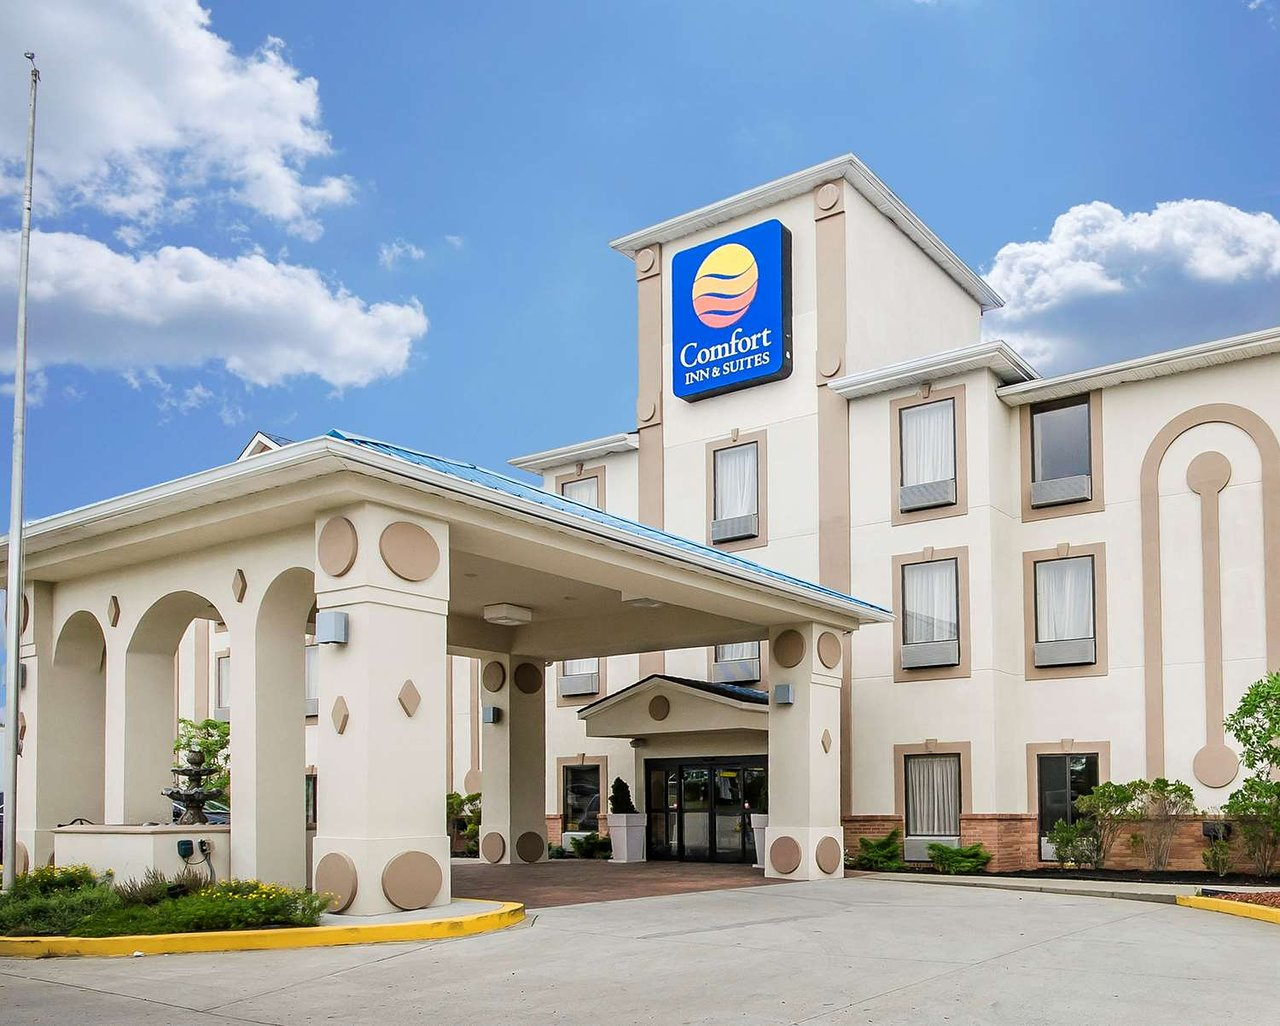 Comfort Inn Suites 67 7 9 Updated 2019 Prices Motel Reviews La Grange Ky Tripadvisor